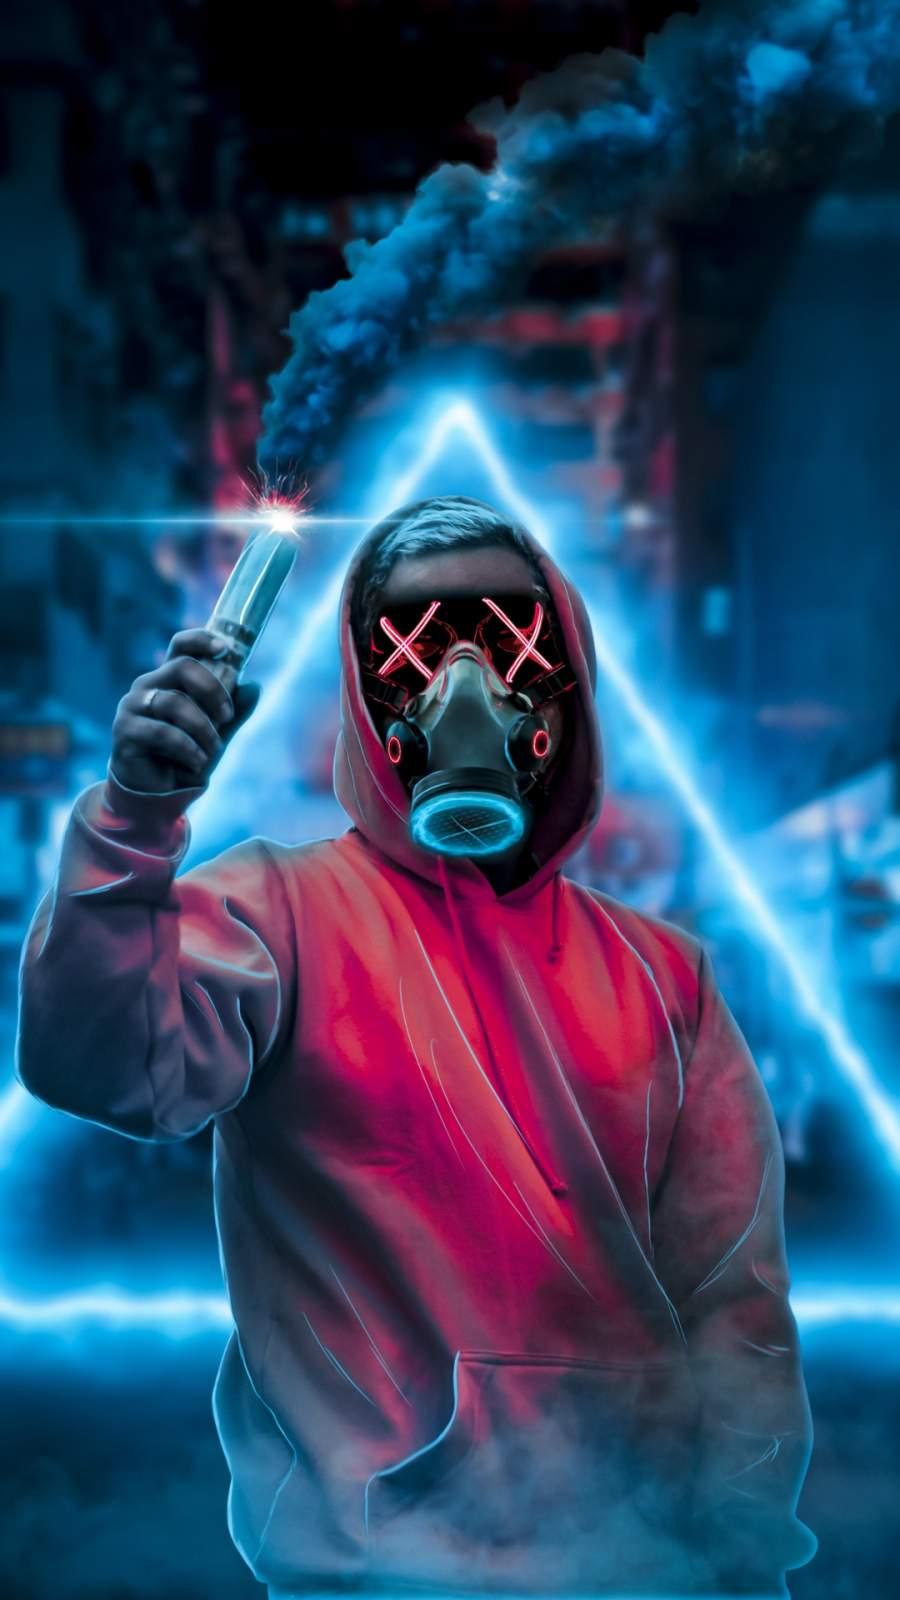 Face Mask Smoke Bomb iPhone Wallpaper